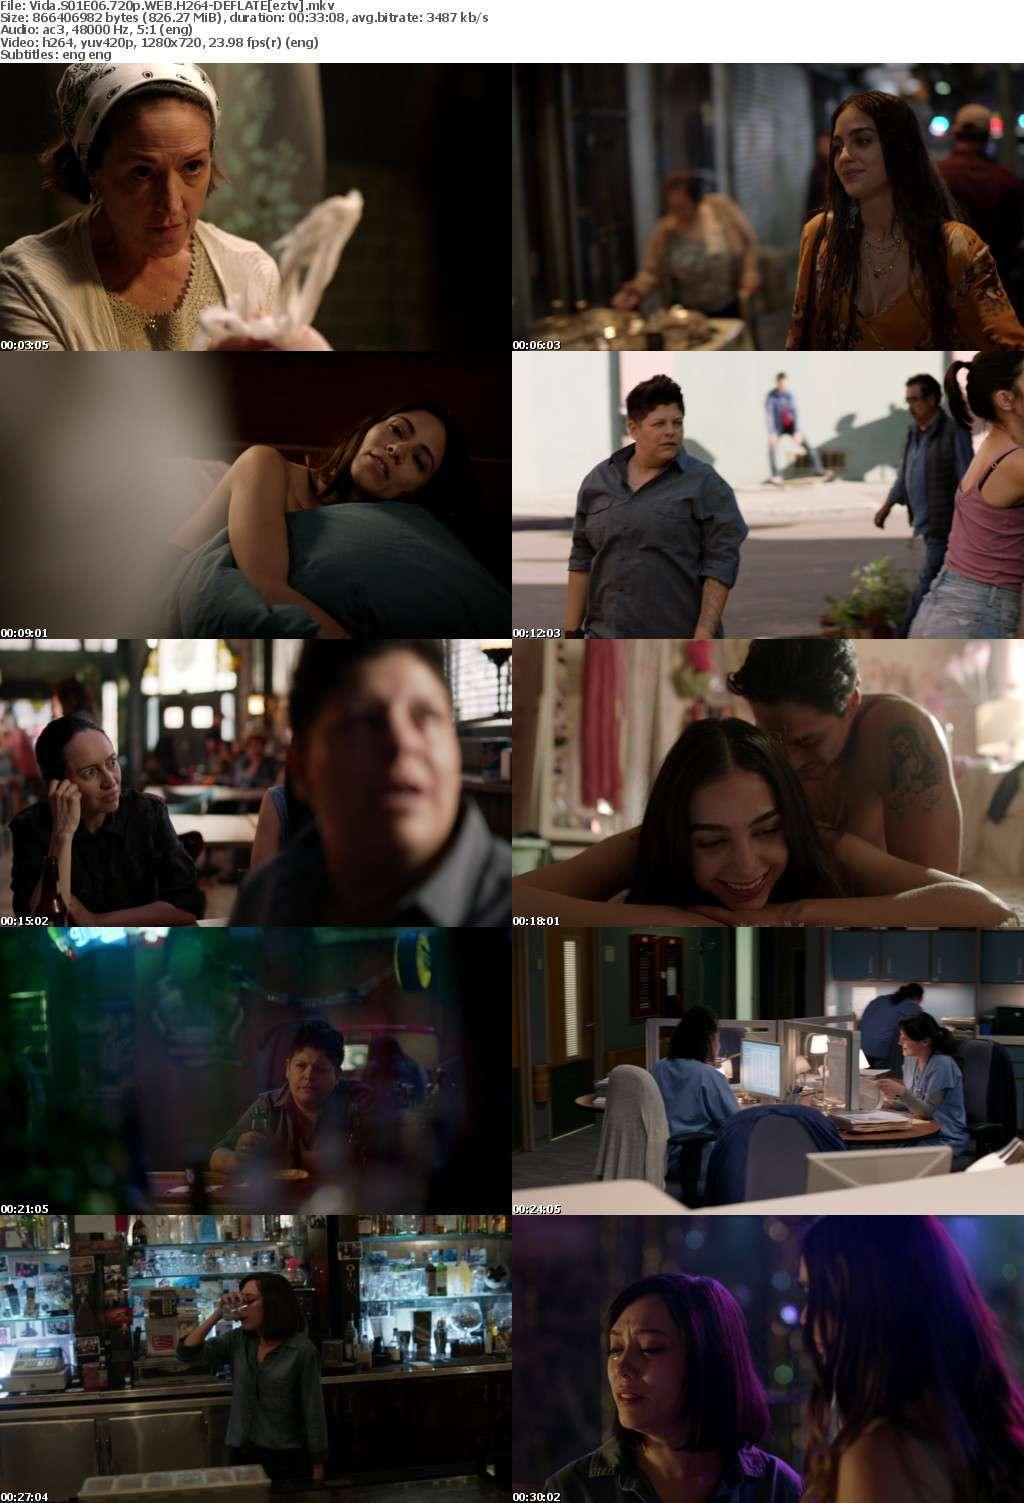 Vida S01E06 720p WEB H264-DEFLATE